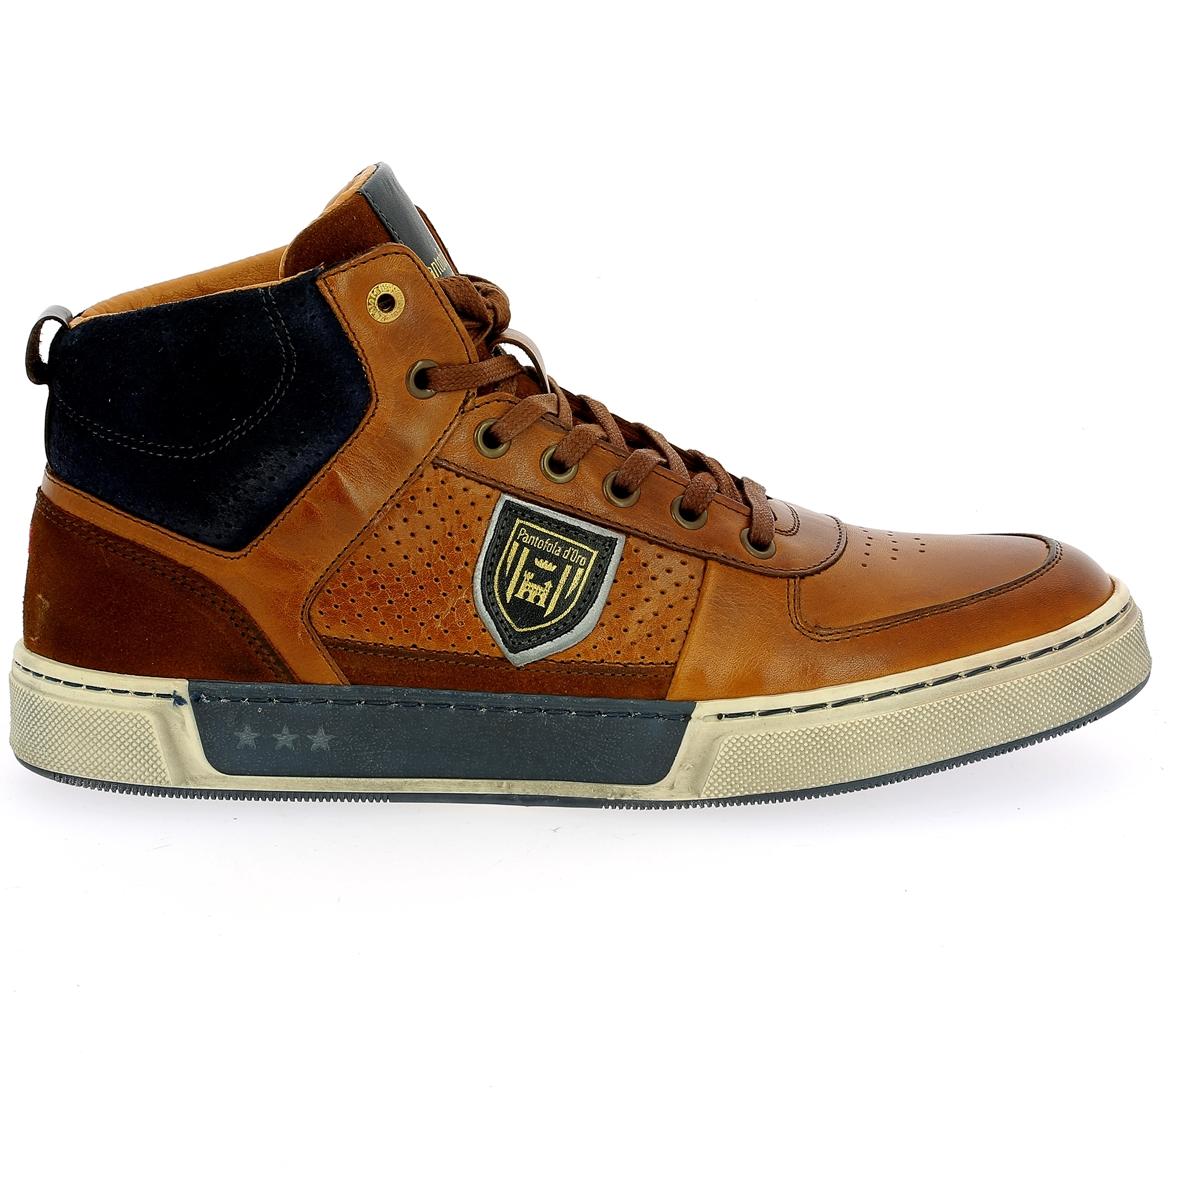 Pantofola D'oro Sneakers cognac